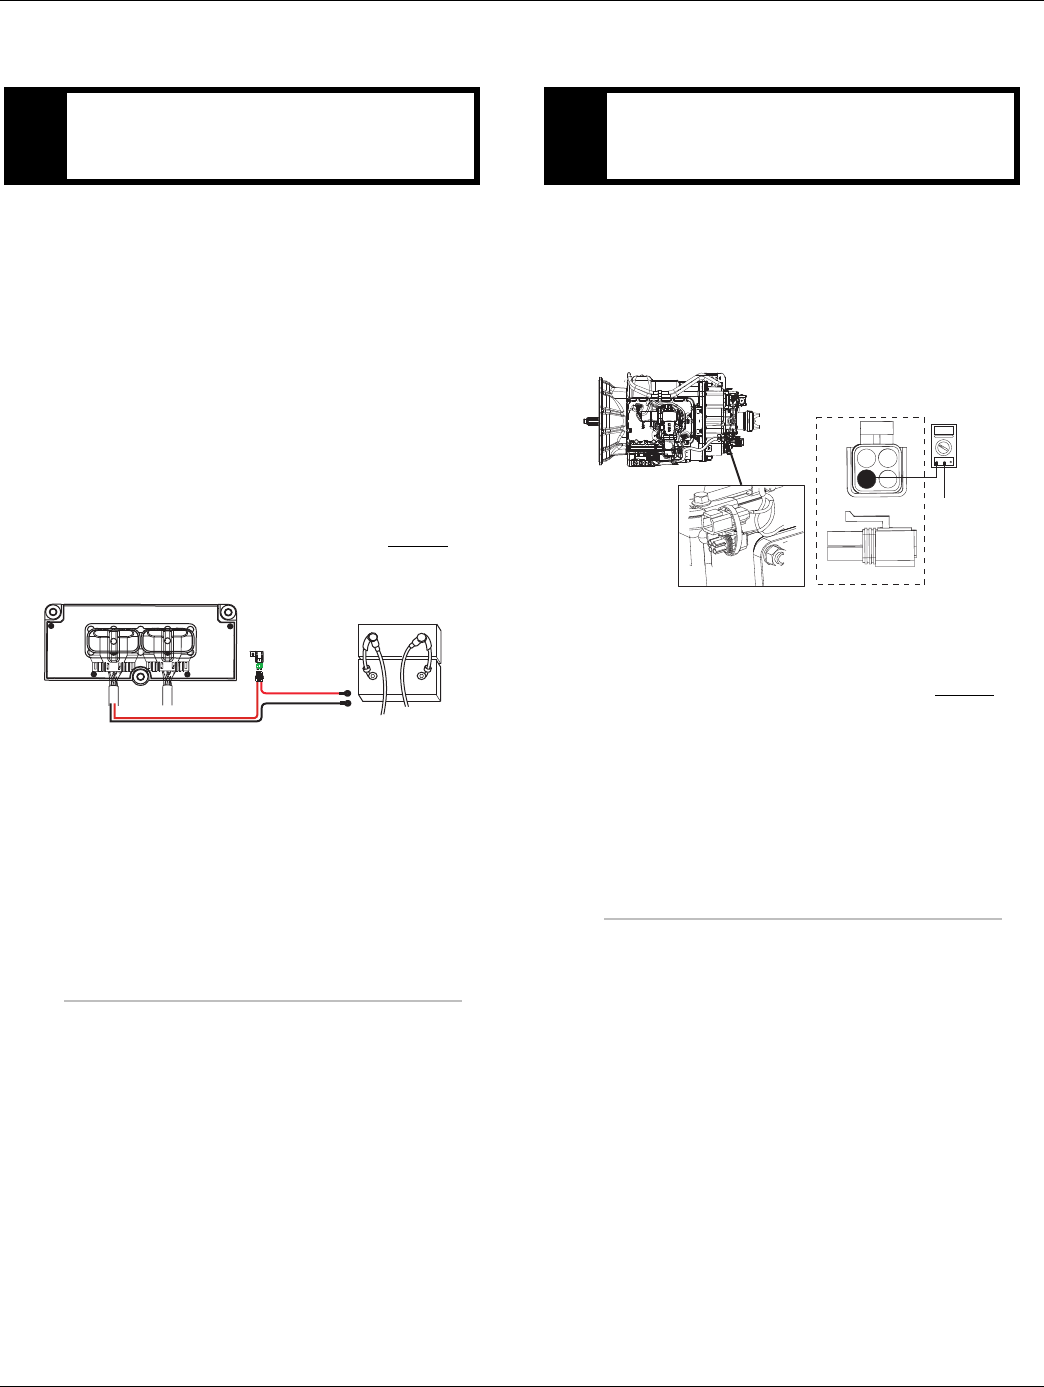 Trts0930 Eaton Gen 3 Autoshift Ultrashift Troubleshooting